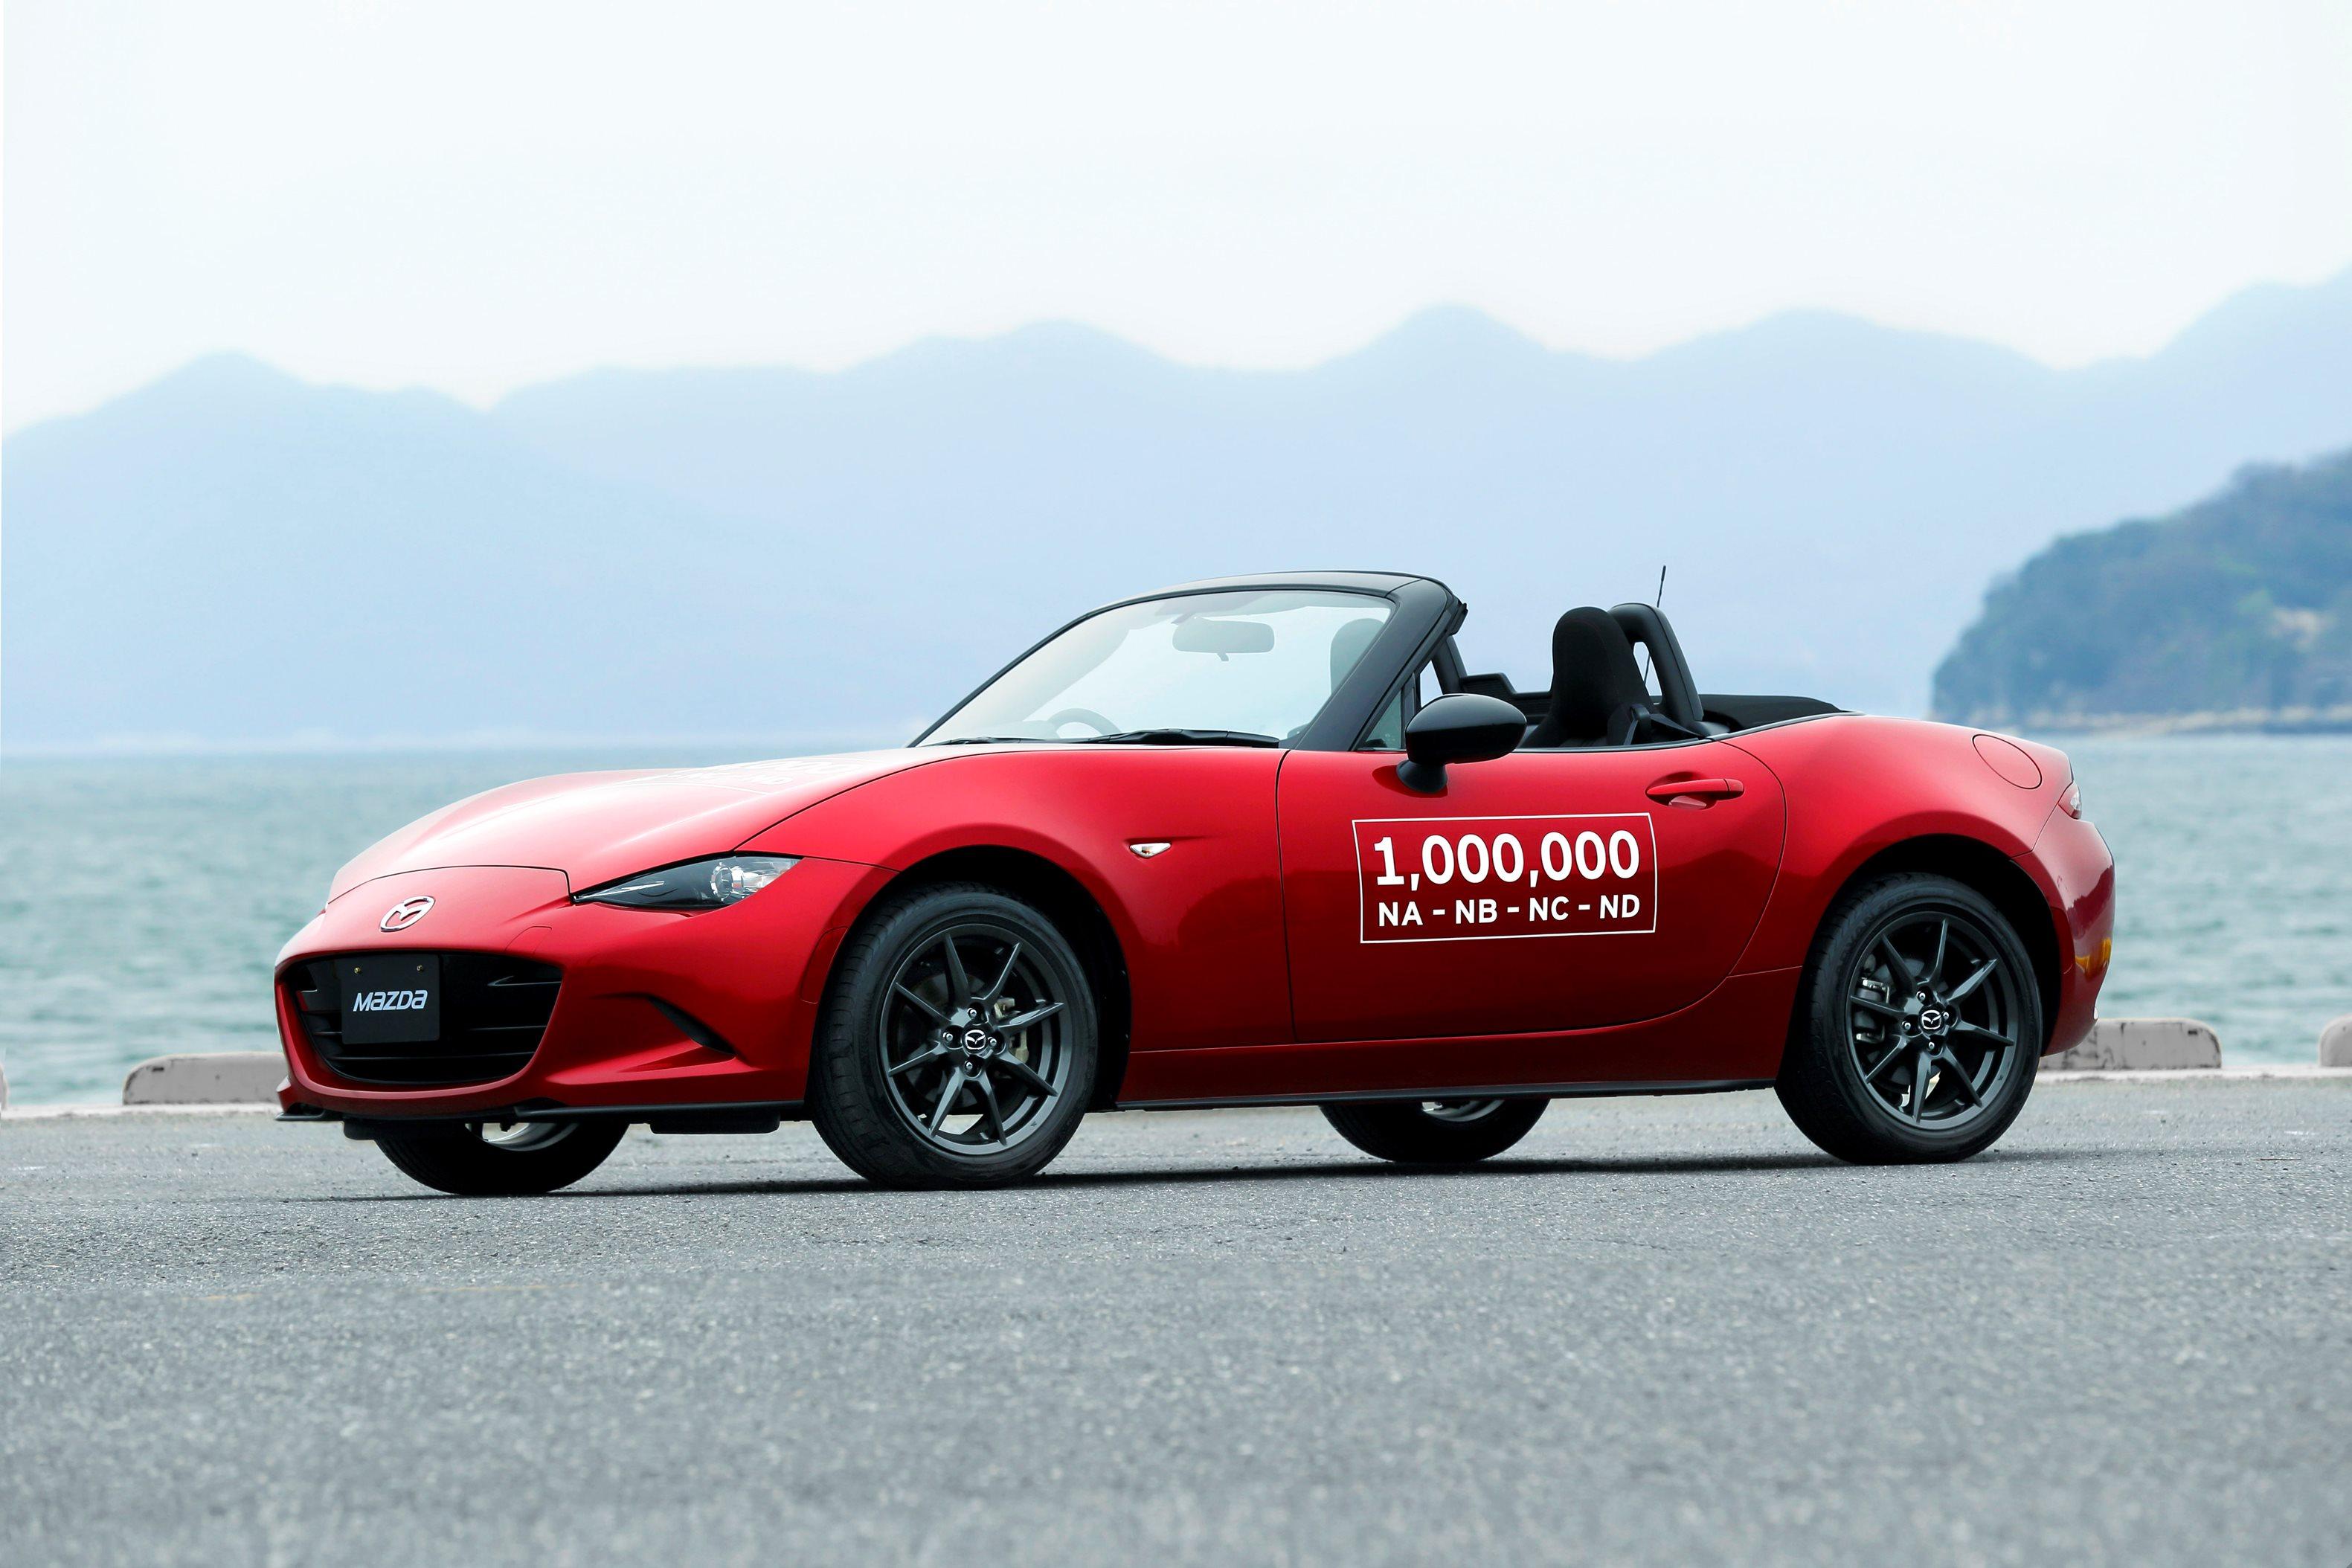 Mazda MX5, celebra un millón de autos en las calles